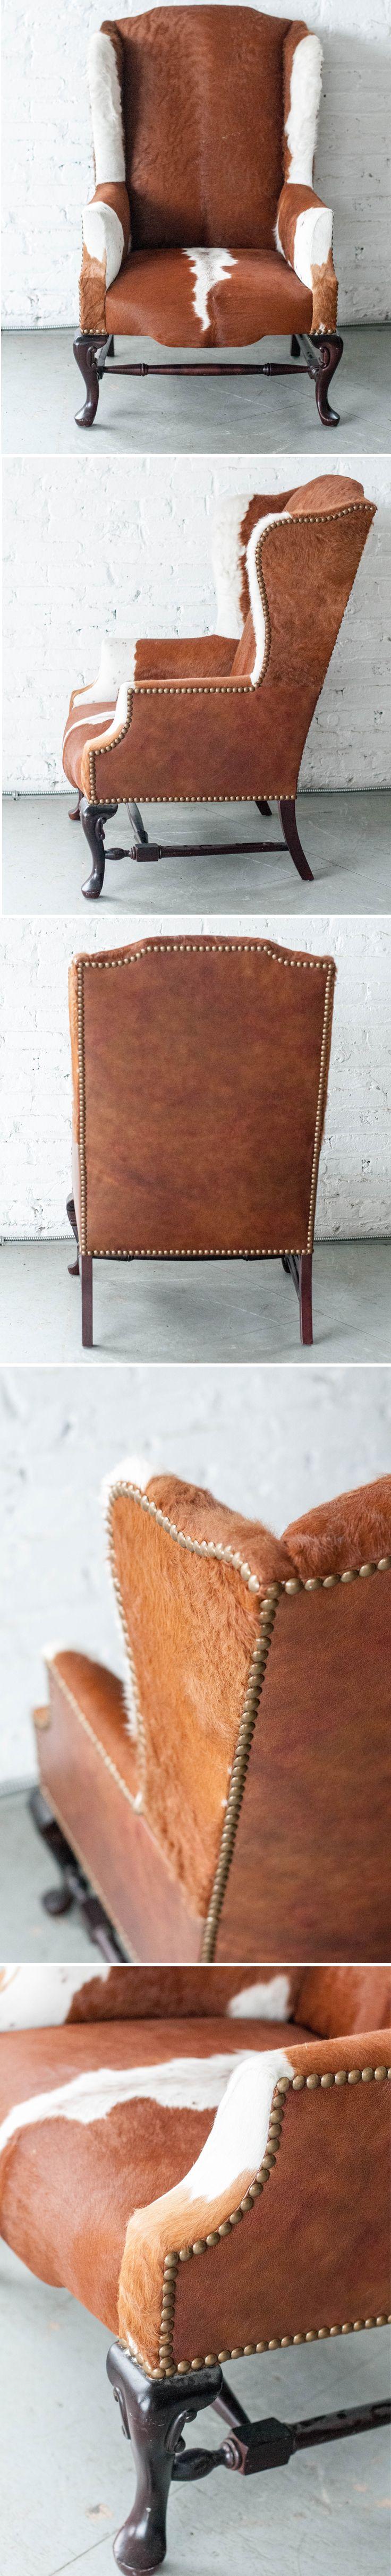 Best 25+ Cowhide Chair Ideas On Pinterest